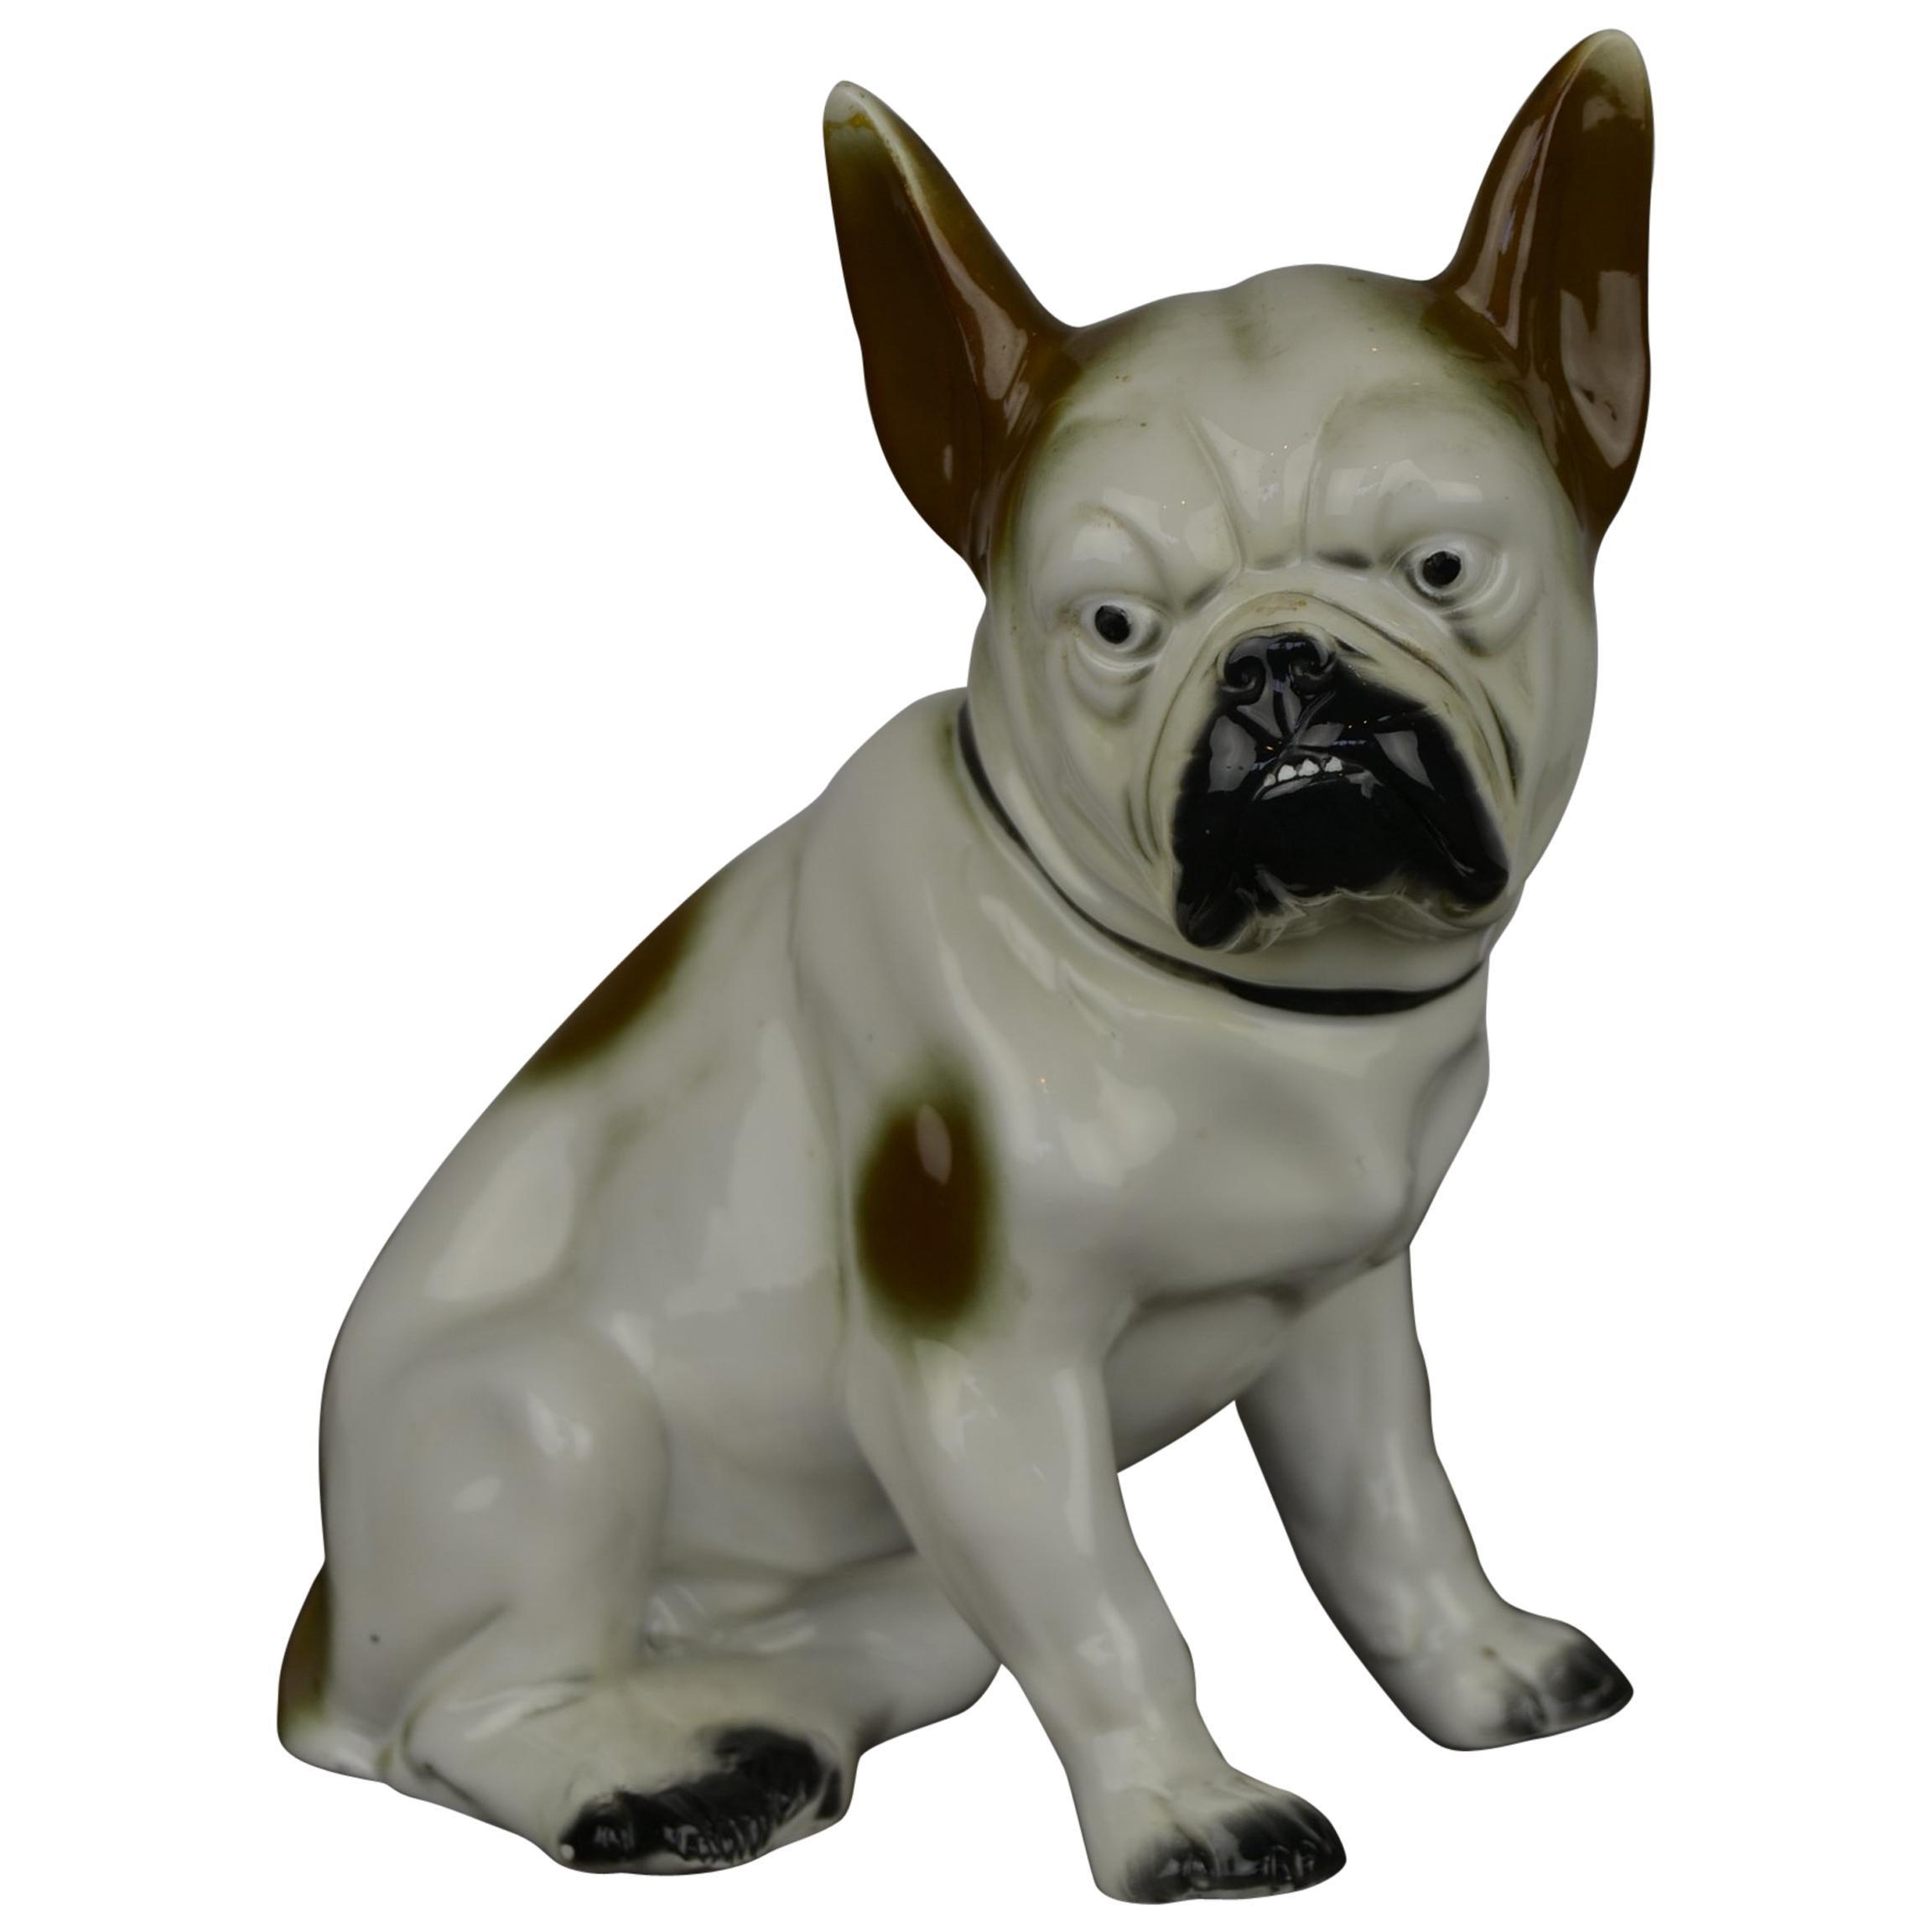 Art Deco Sitzendorf Porcelain French Bulldog Figurine